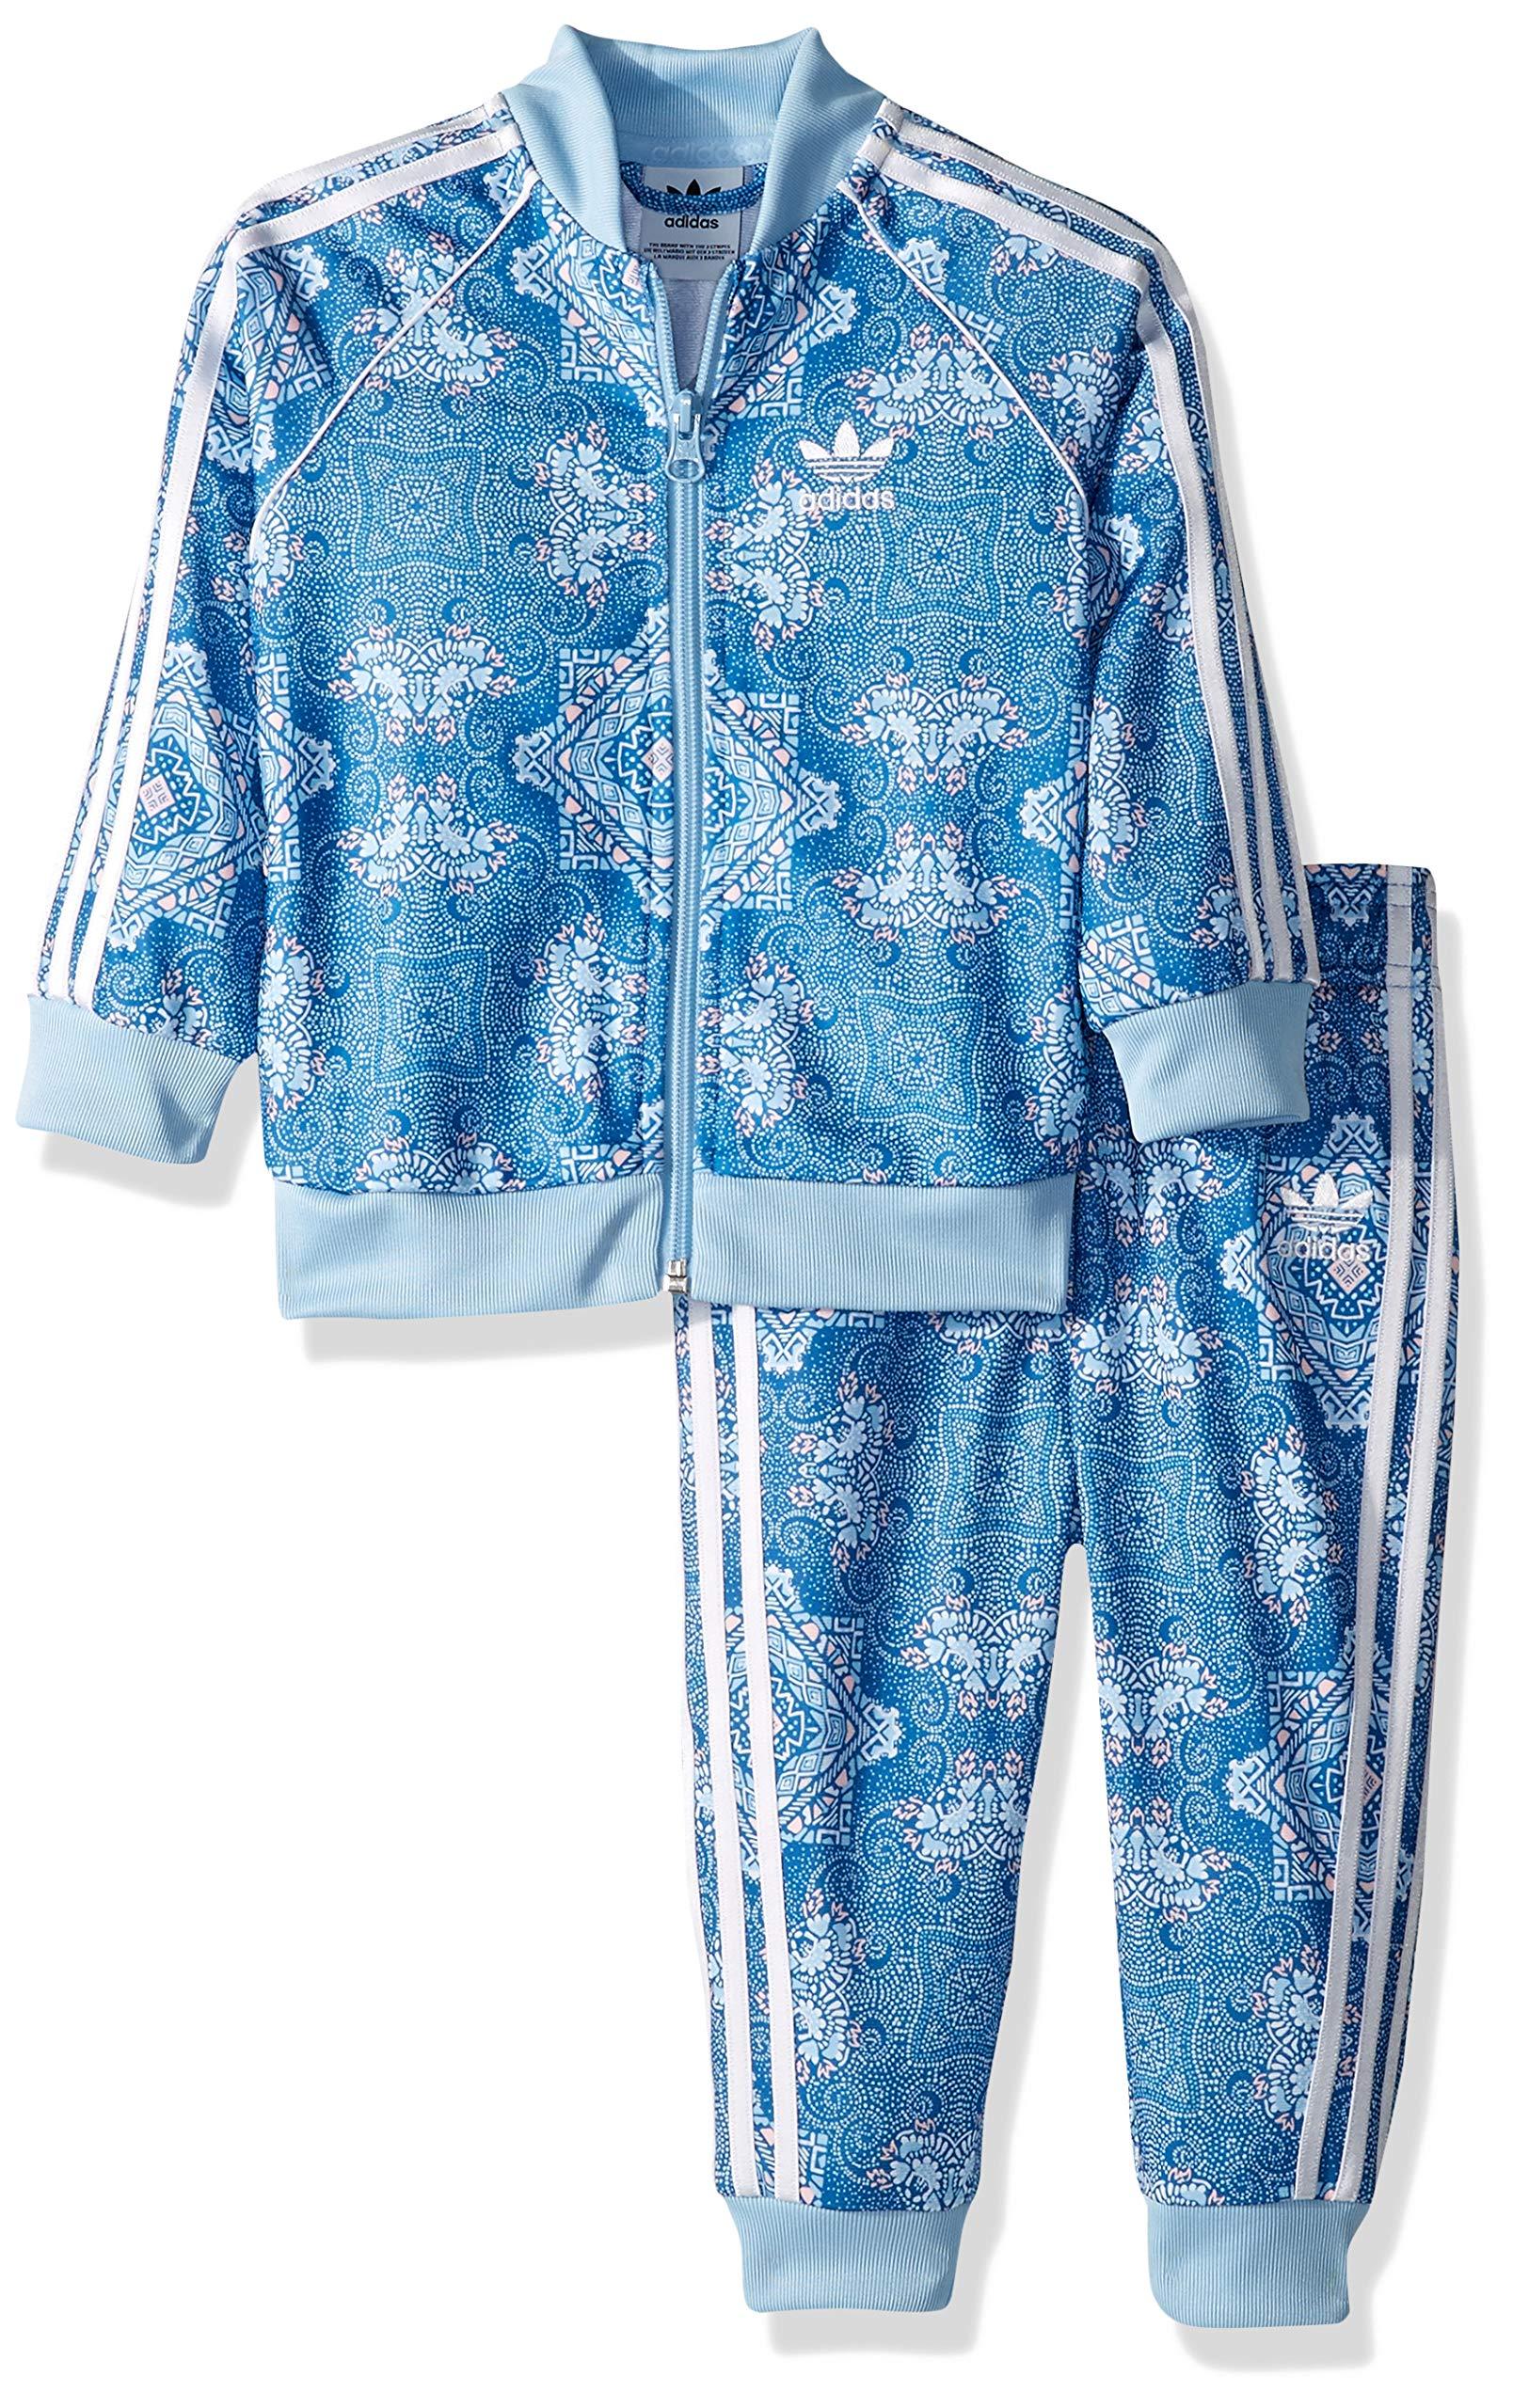 adidas Originals Baby Culture Clash SST Track Suit